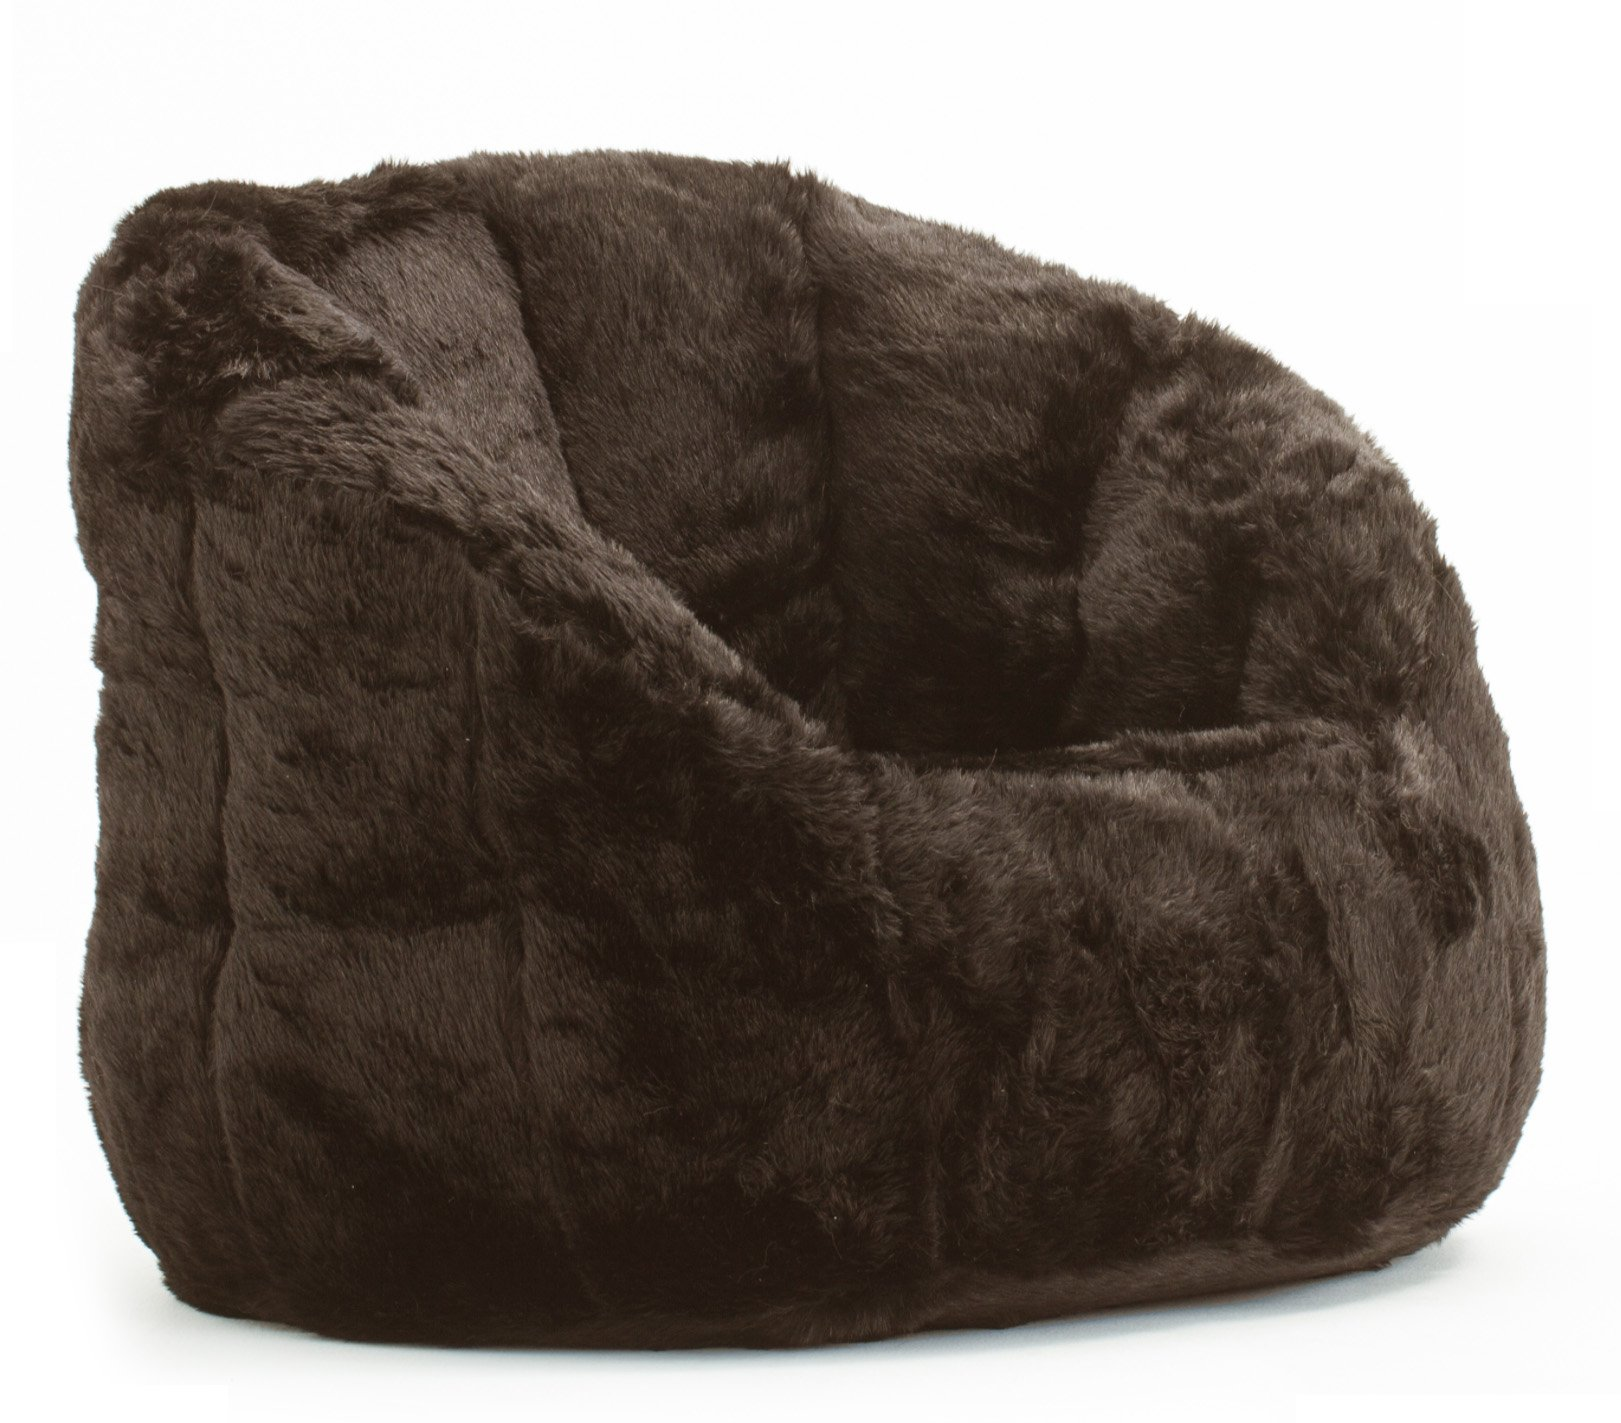 Cocoon Faux Fur Bean Bag Chair, Multiple Colors by Urban Shop